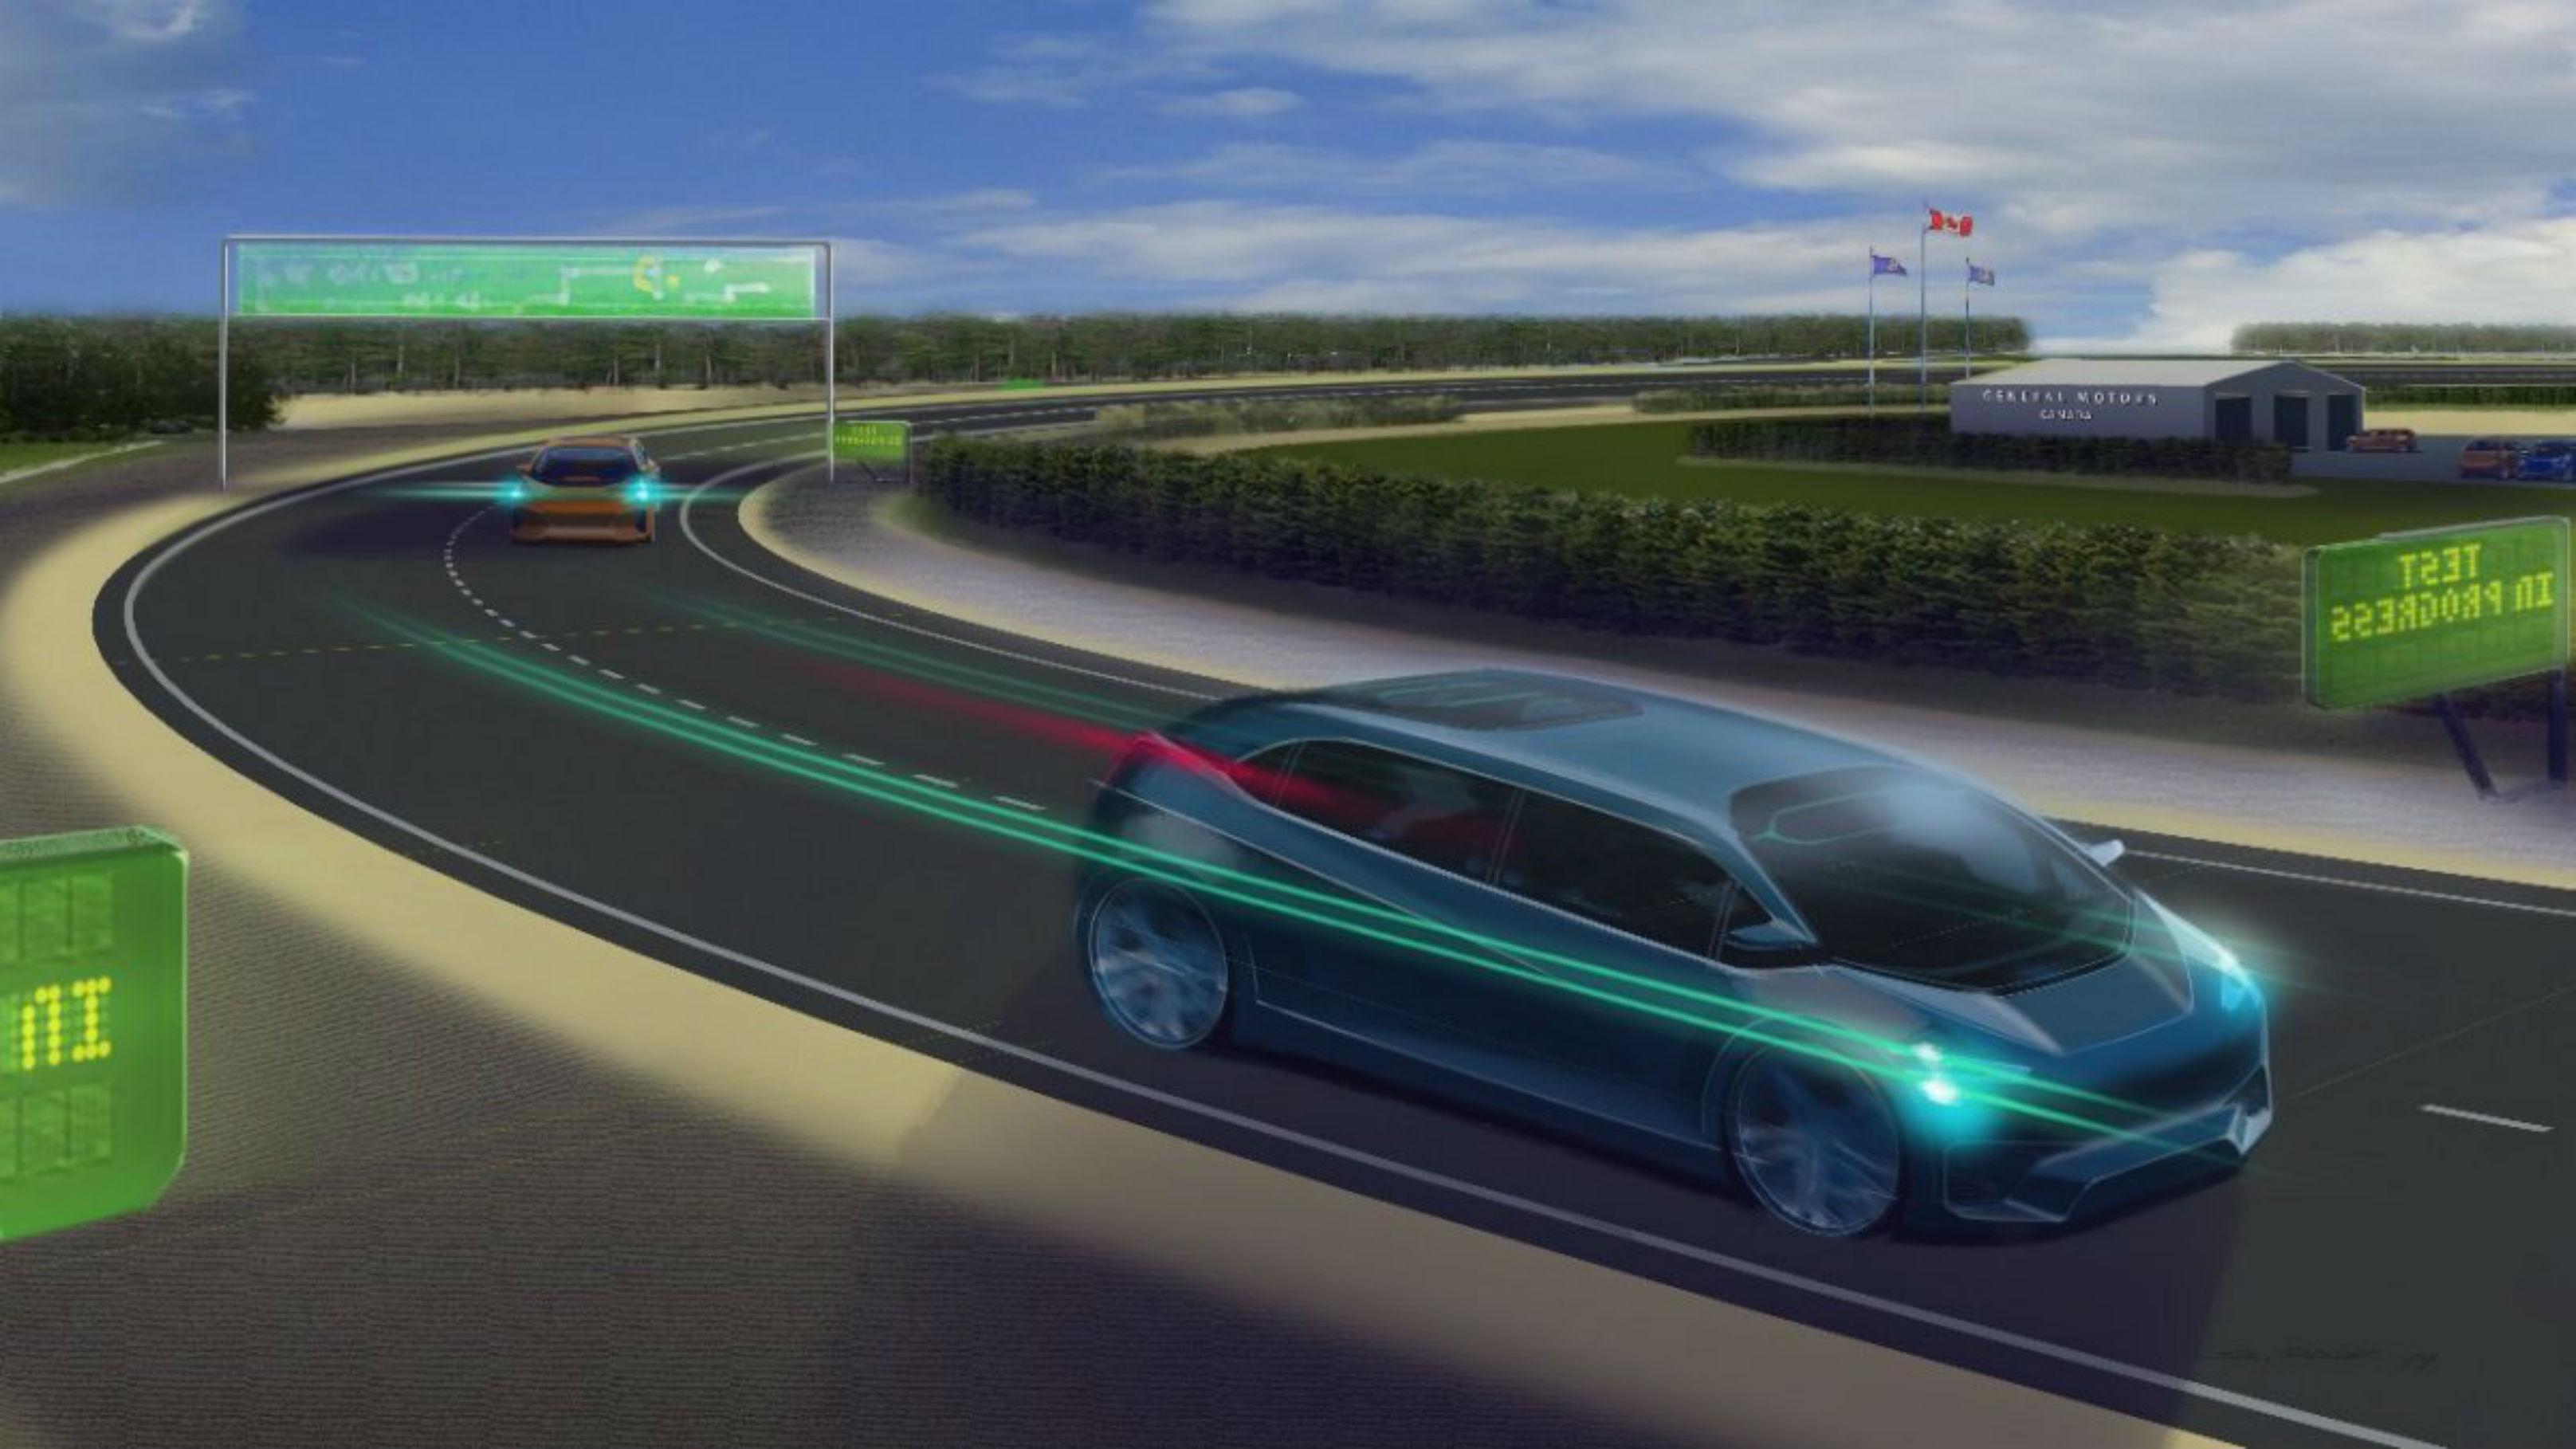 McLaughlin Advanced Technology Track